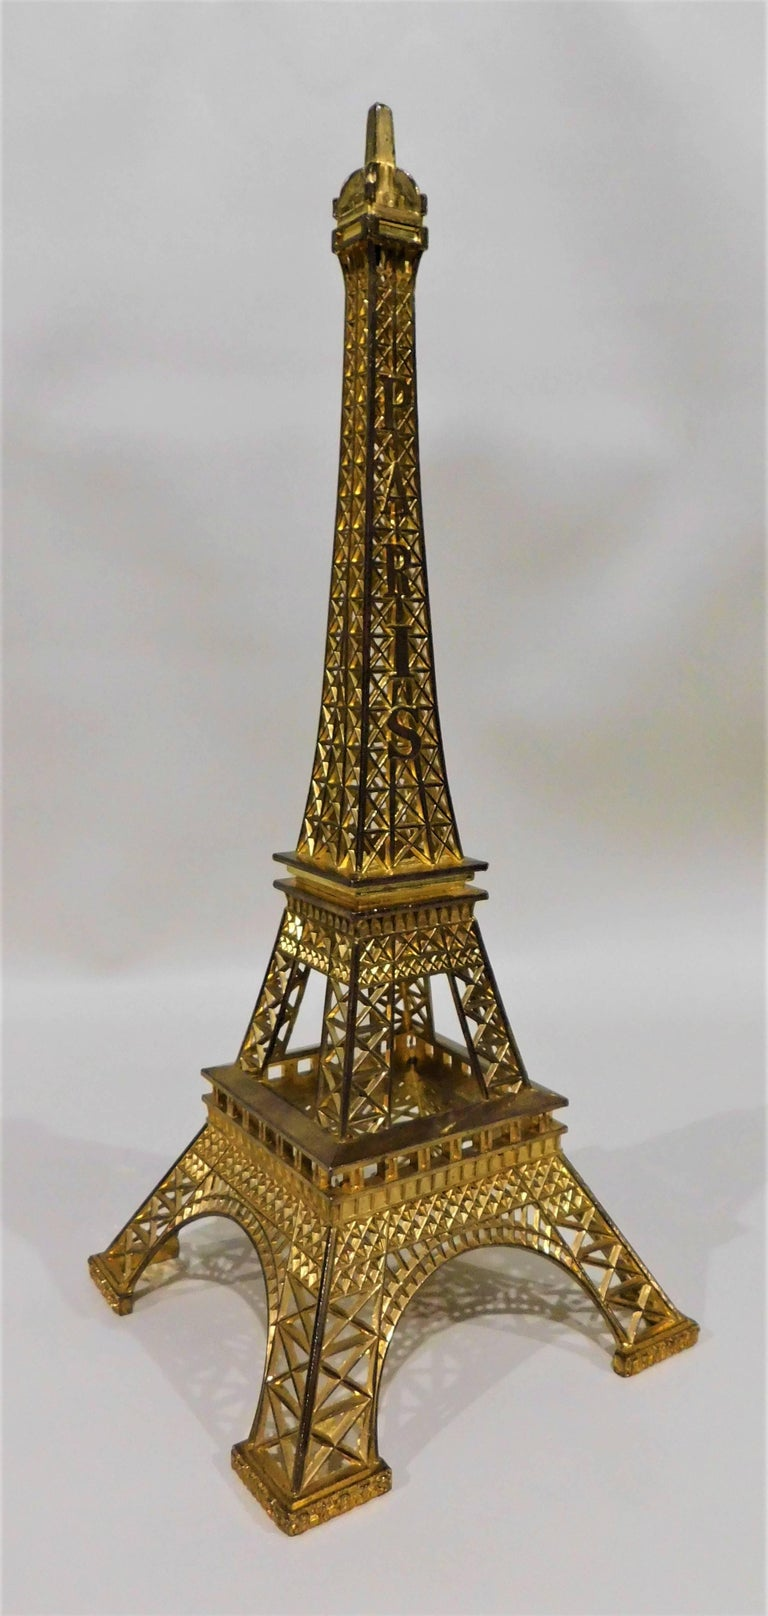 Eiffel Tower Paris France Gilt Metal Display Model Souvenir 4